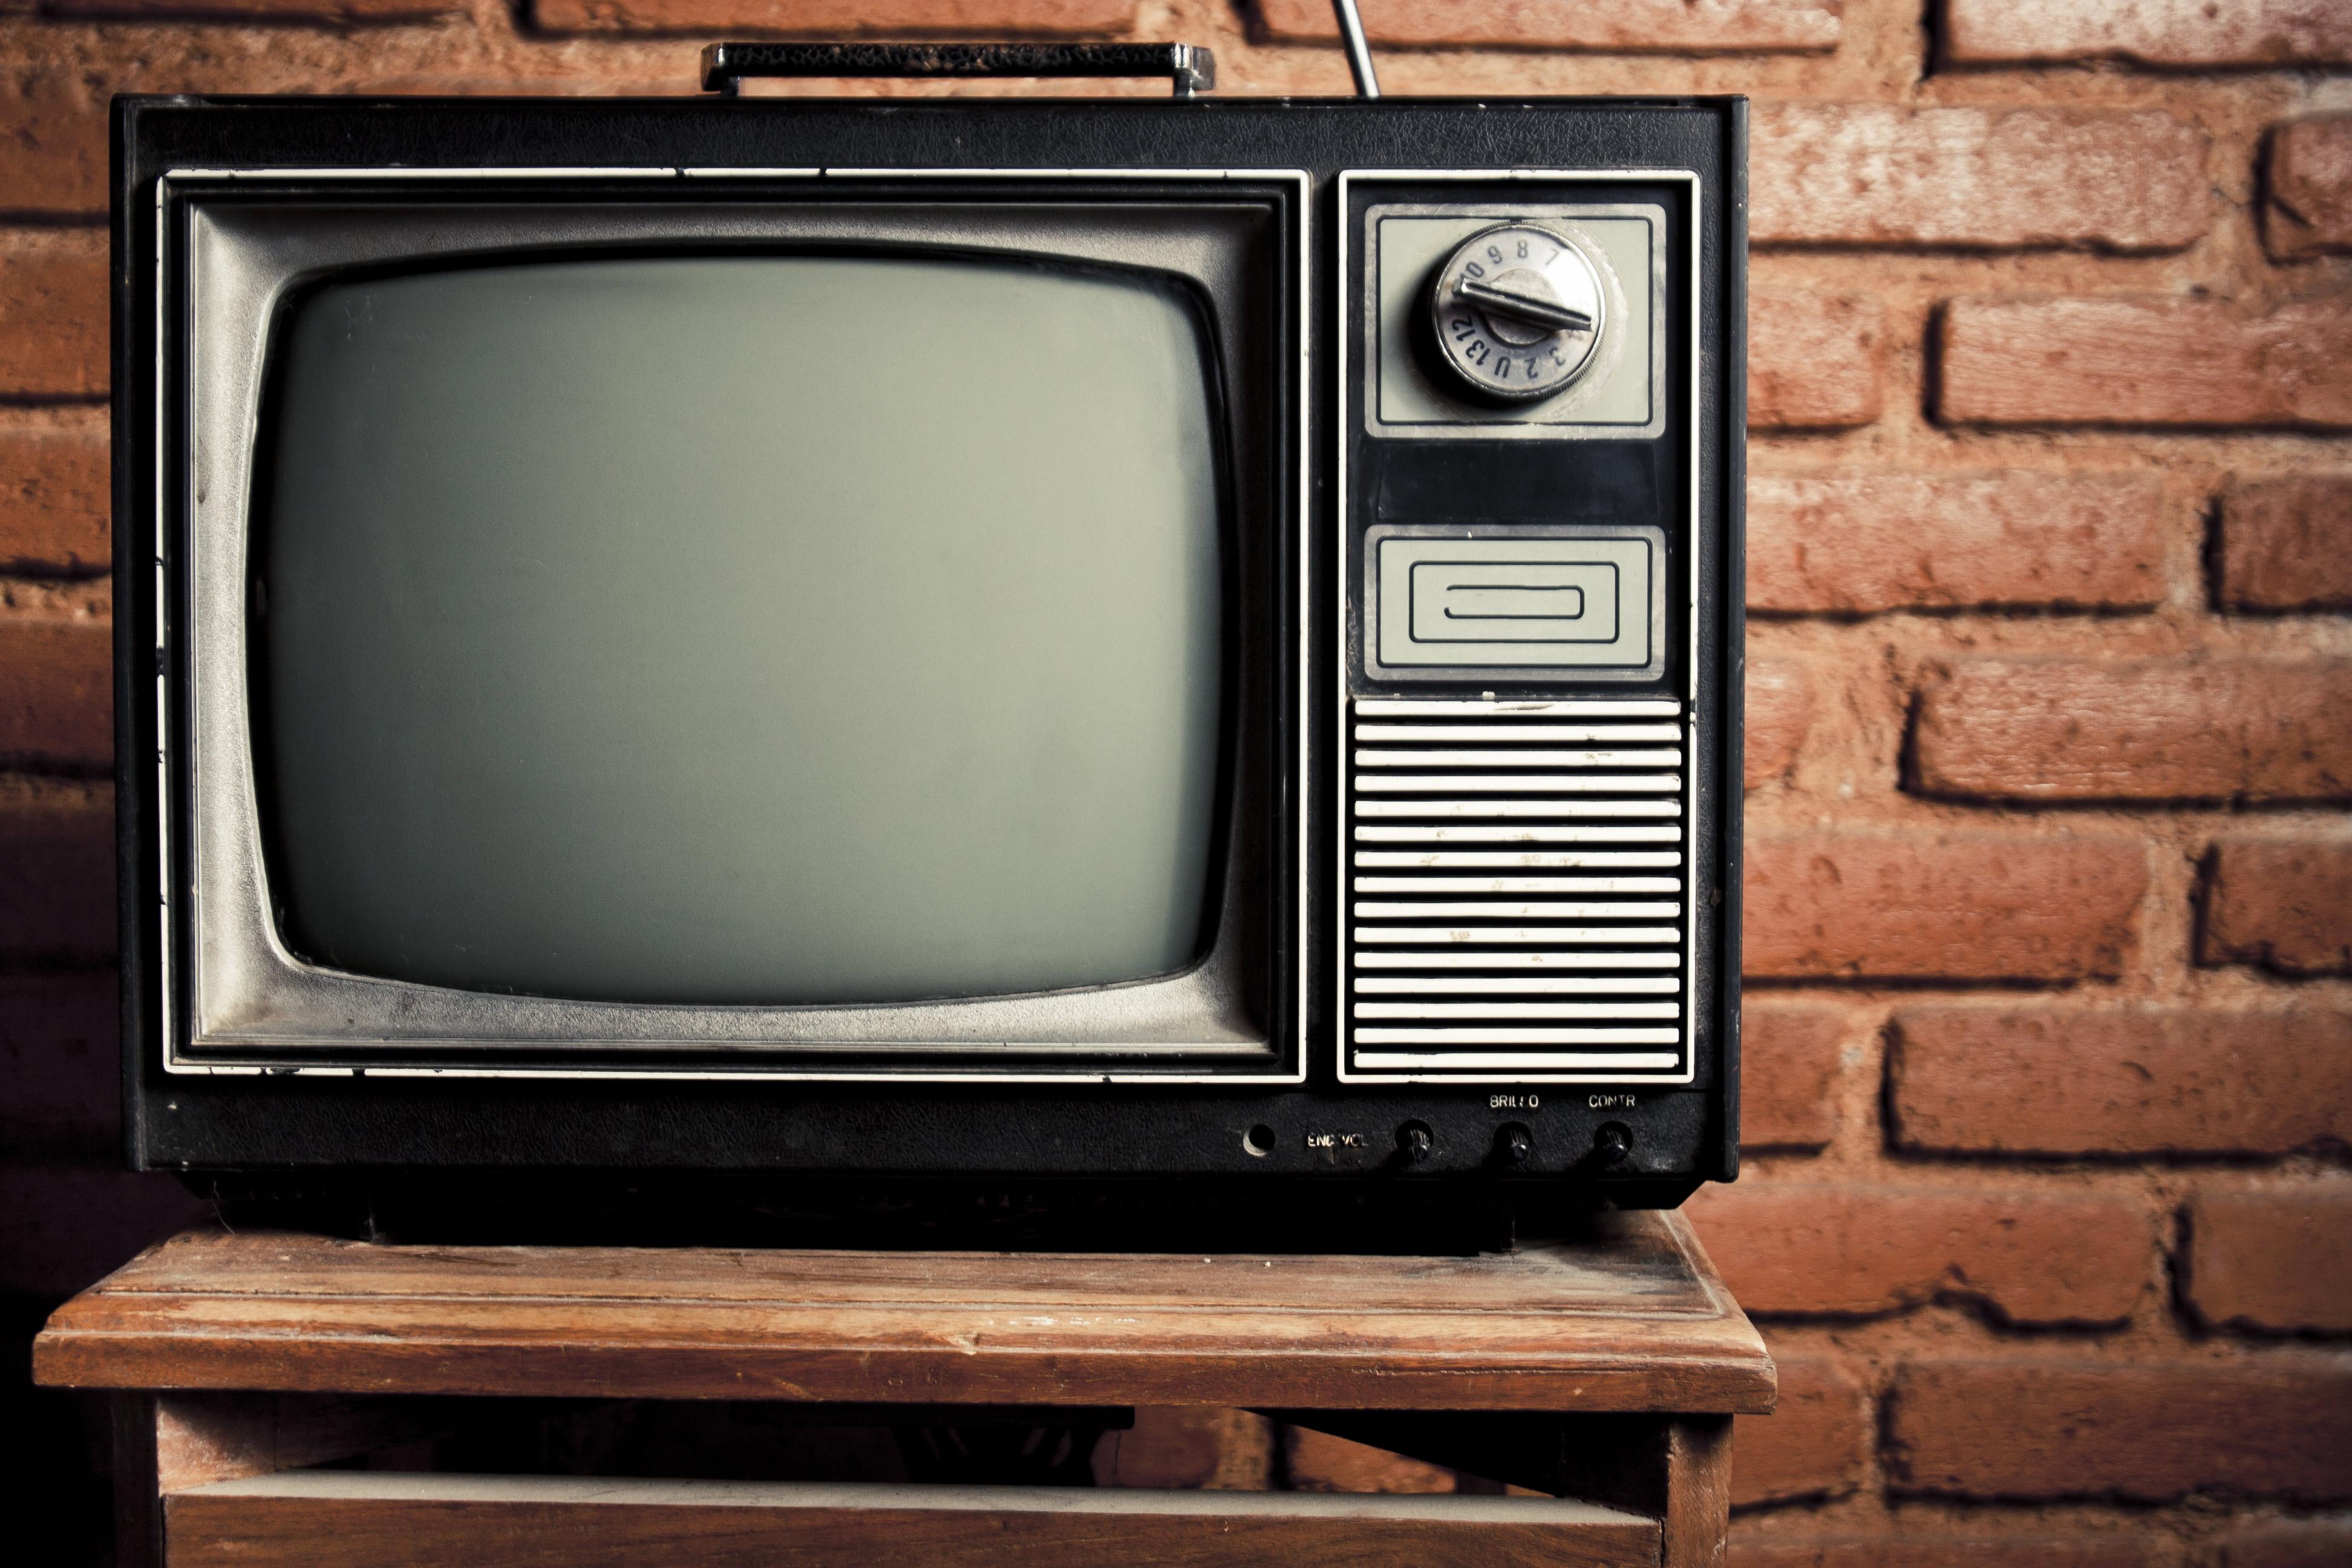 картинки для экрана телевизора